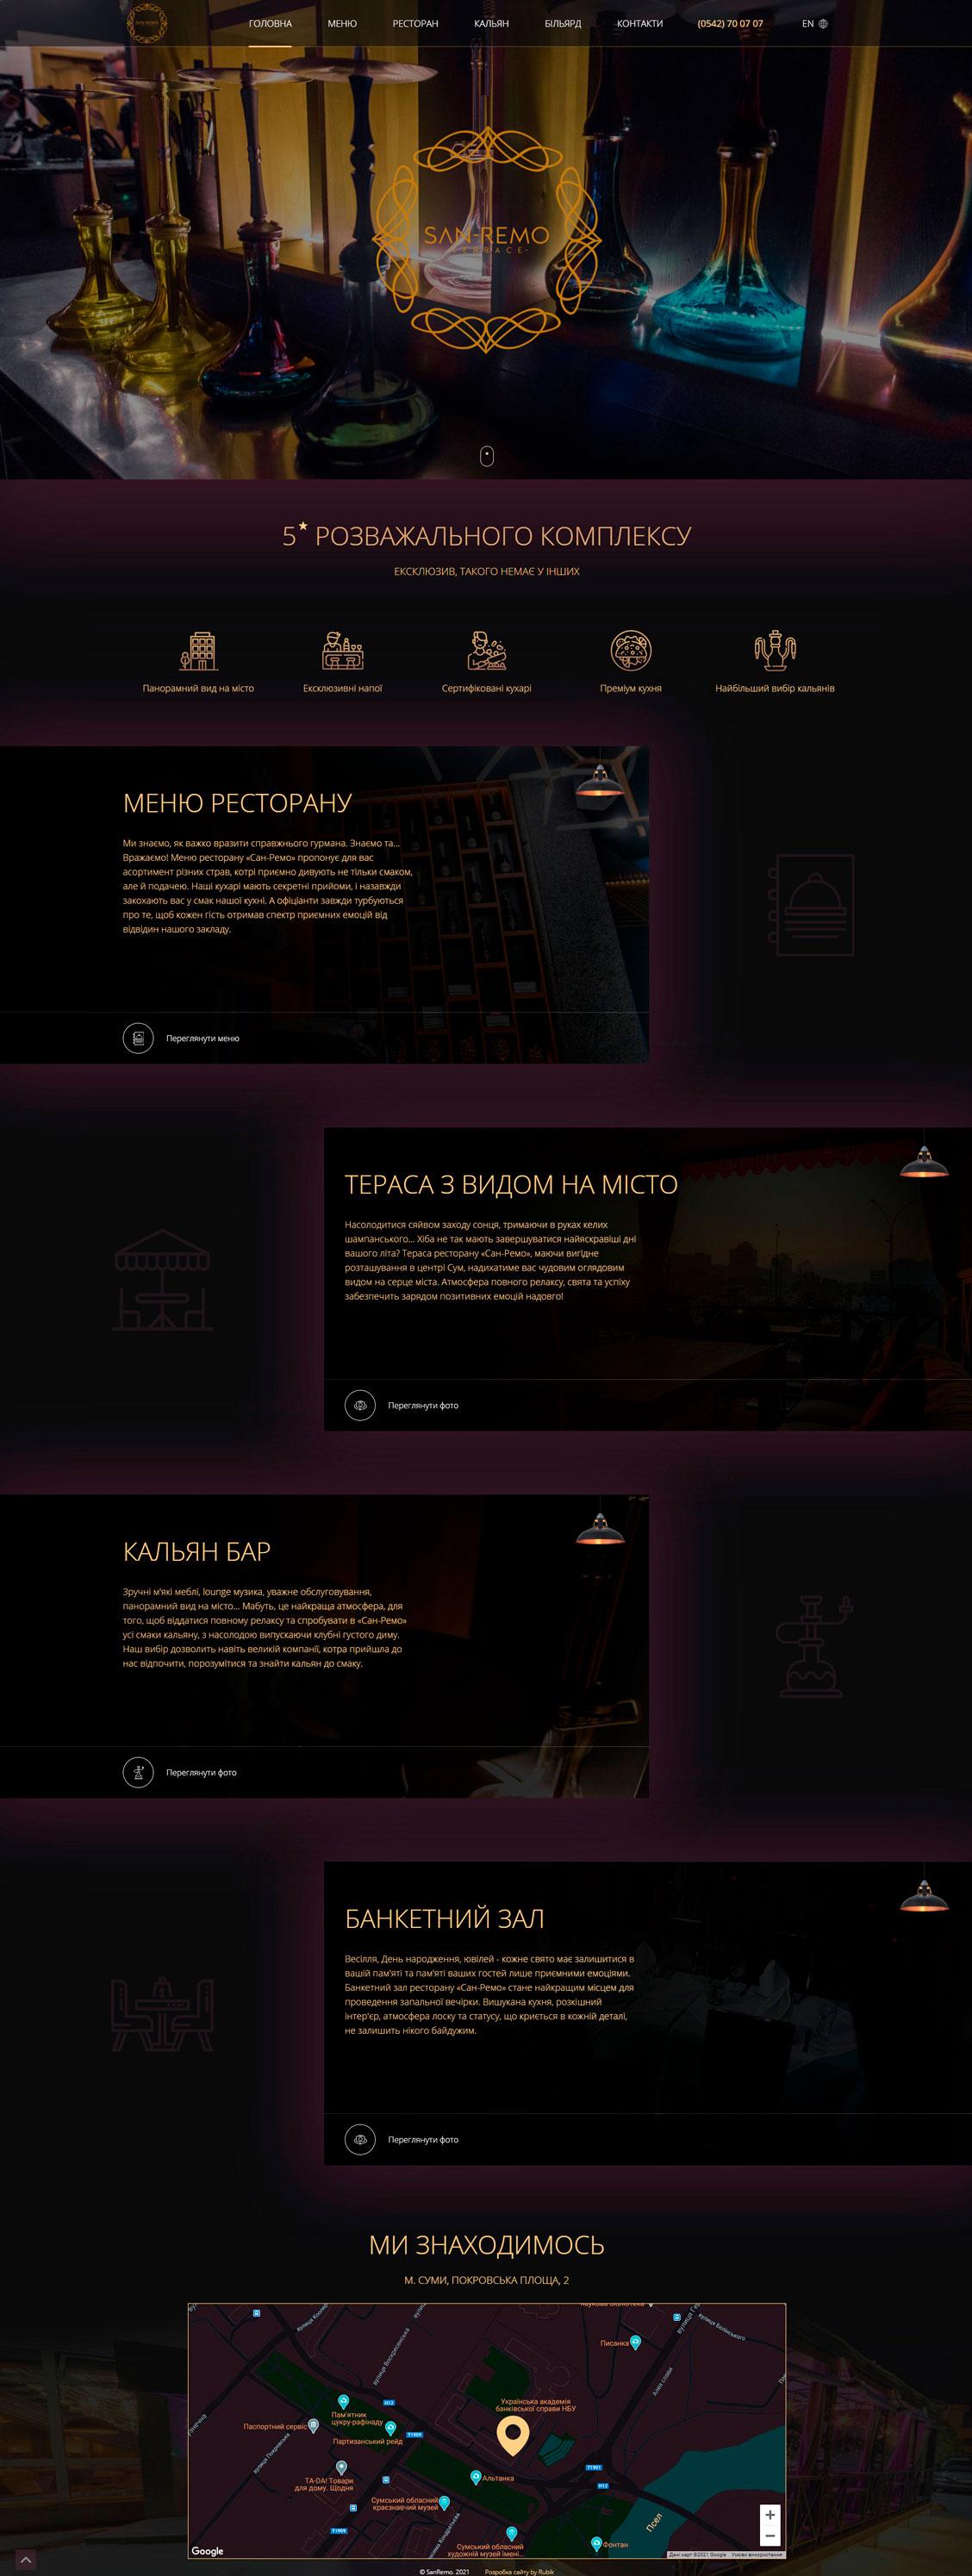 Главная страница San-Remo